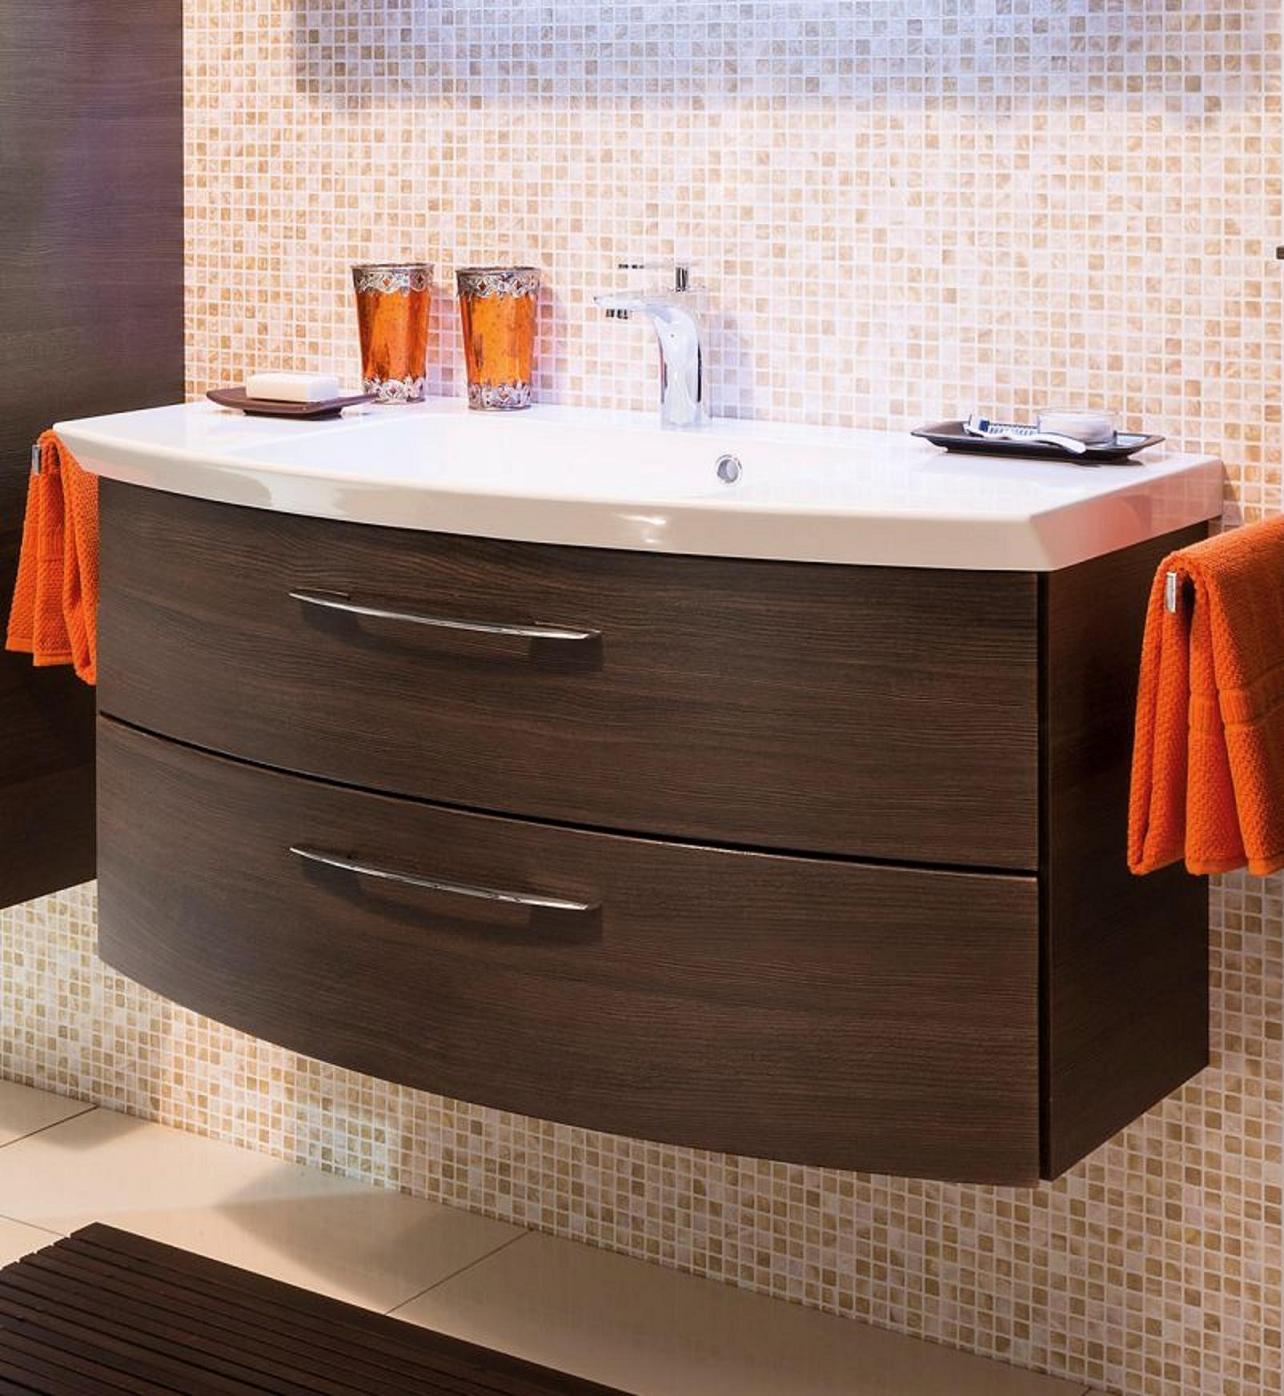 pelipal cassca waschtisch set 101 cm 2 ausz ge g nstig kaufen m bel universum. Black Bedroom Furniture Sets. Home Design Ideas